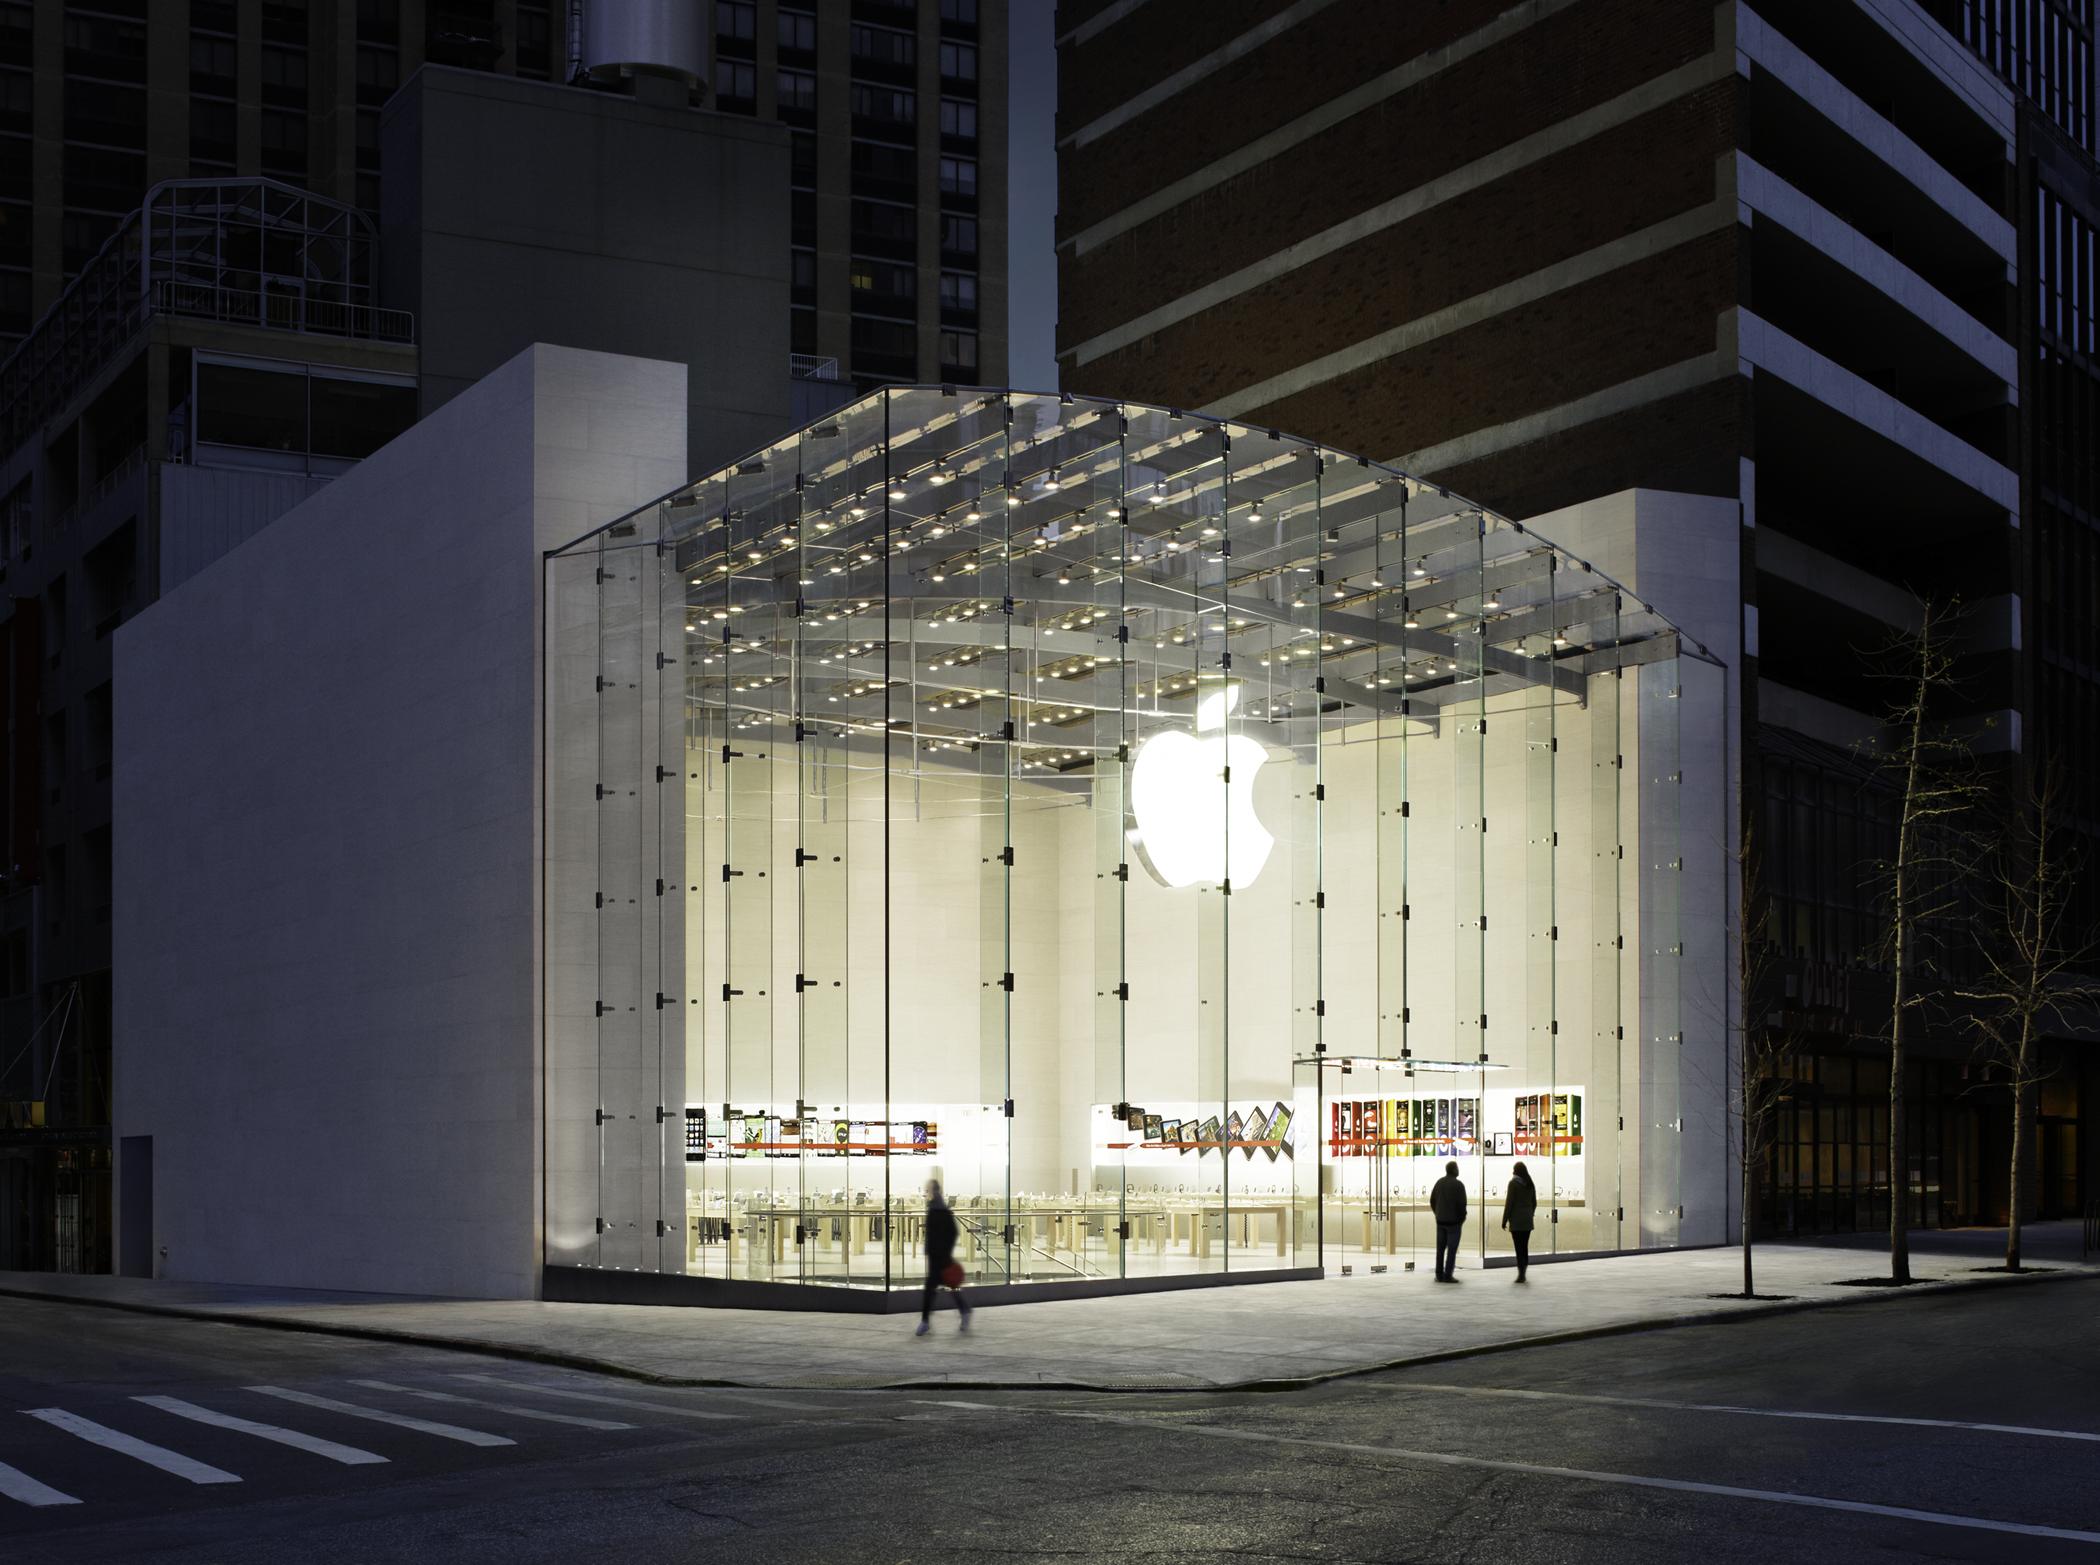 Apple Store, Upper West Side New York City